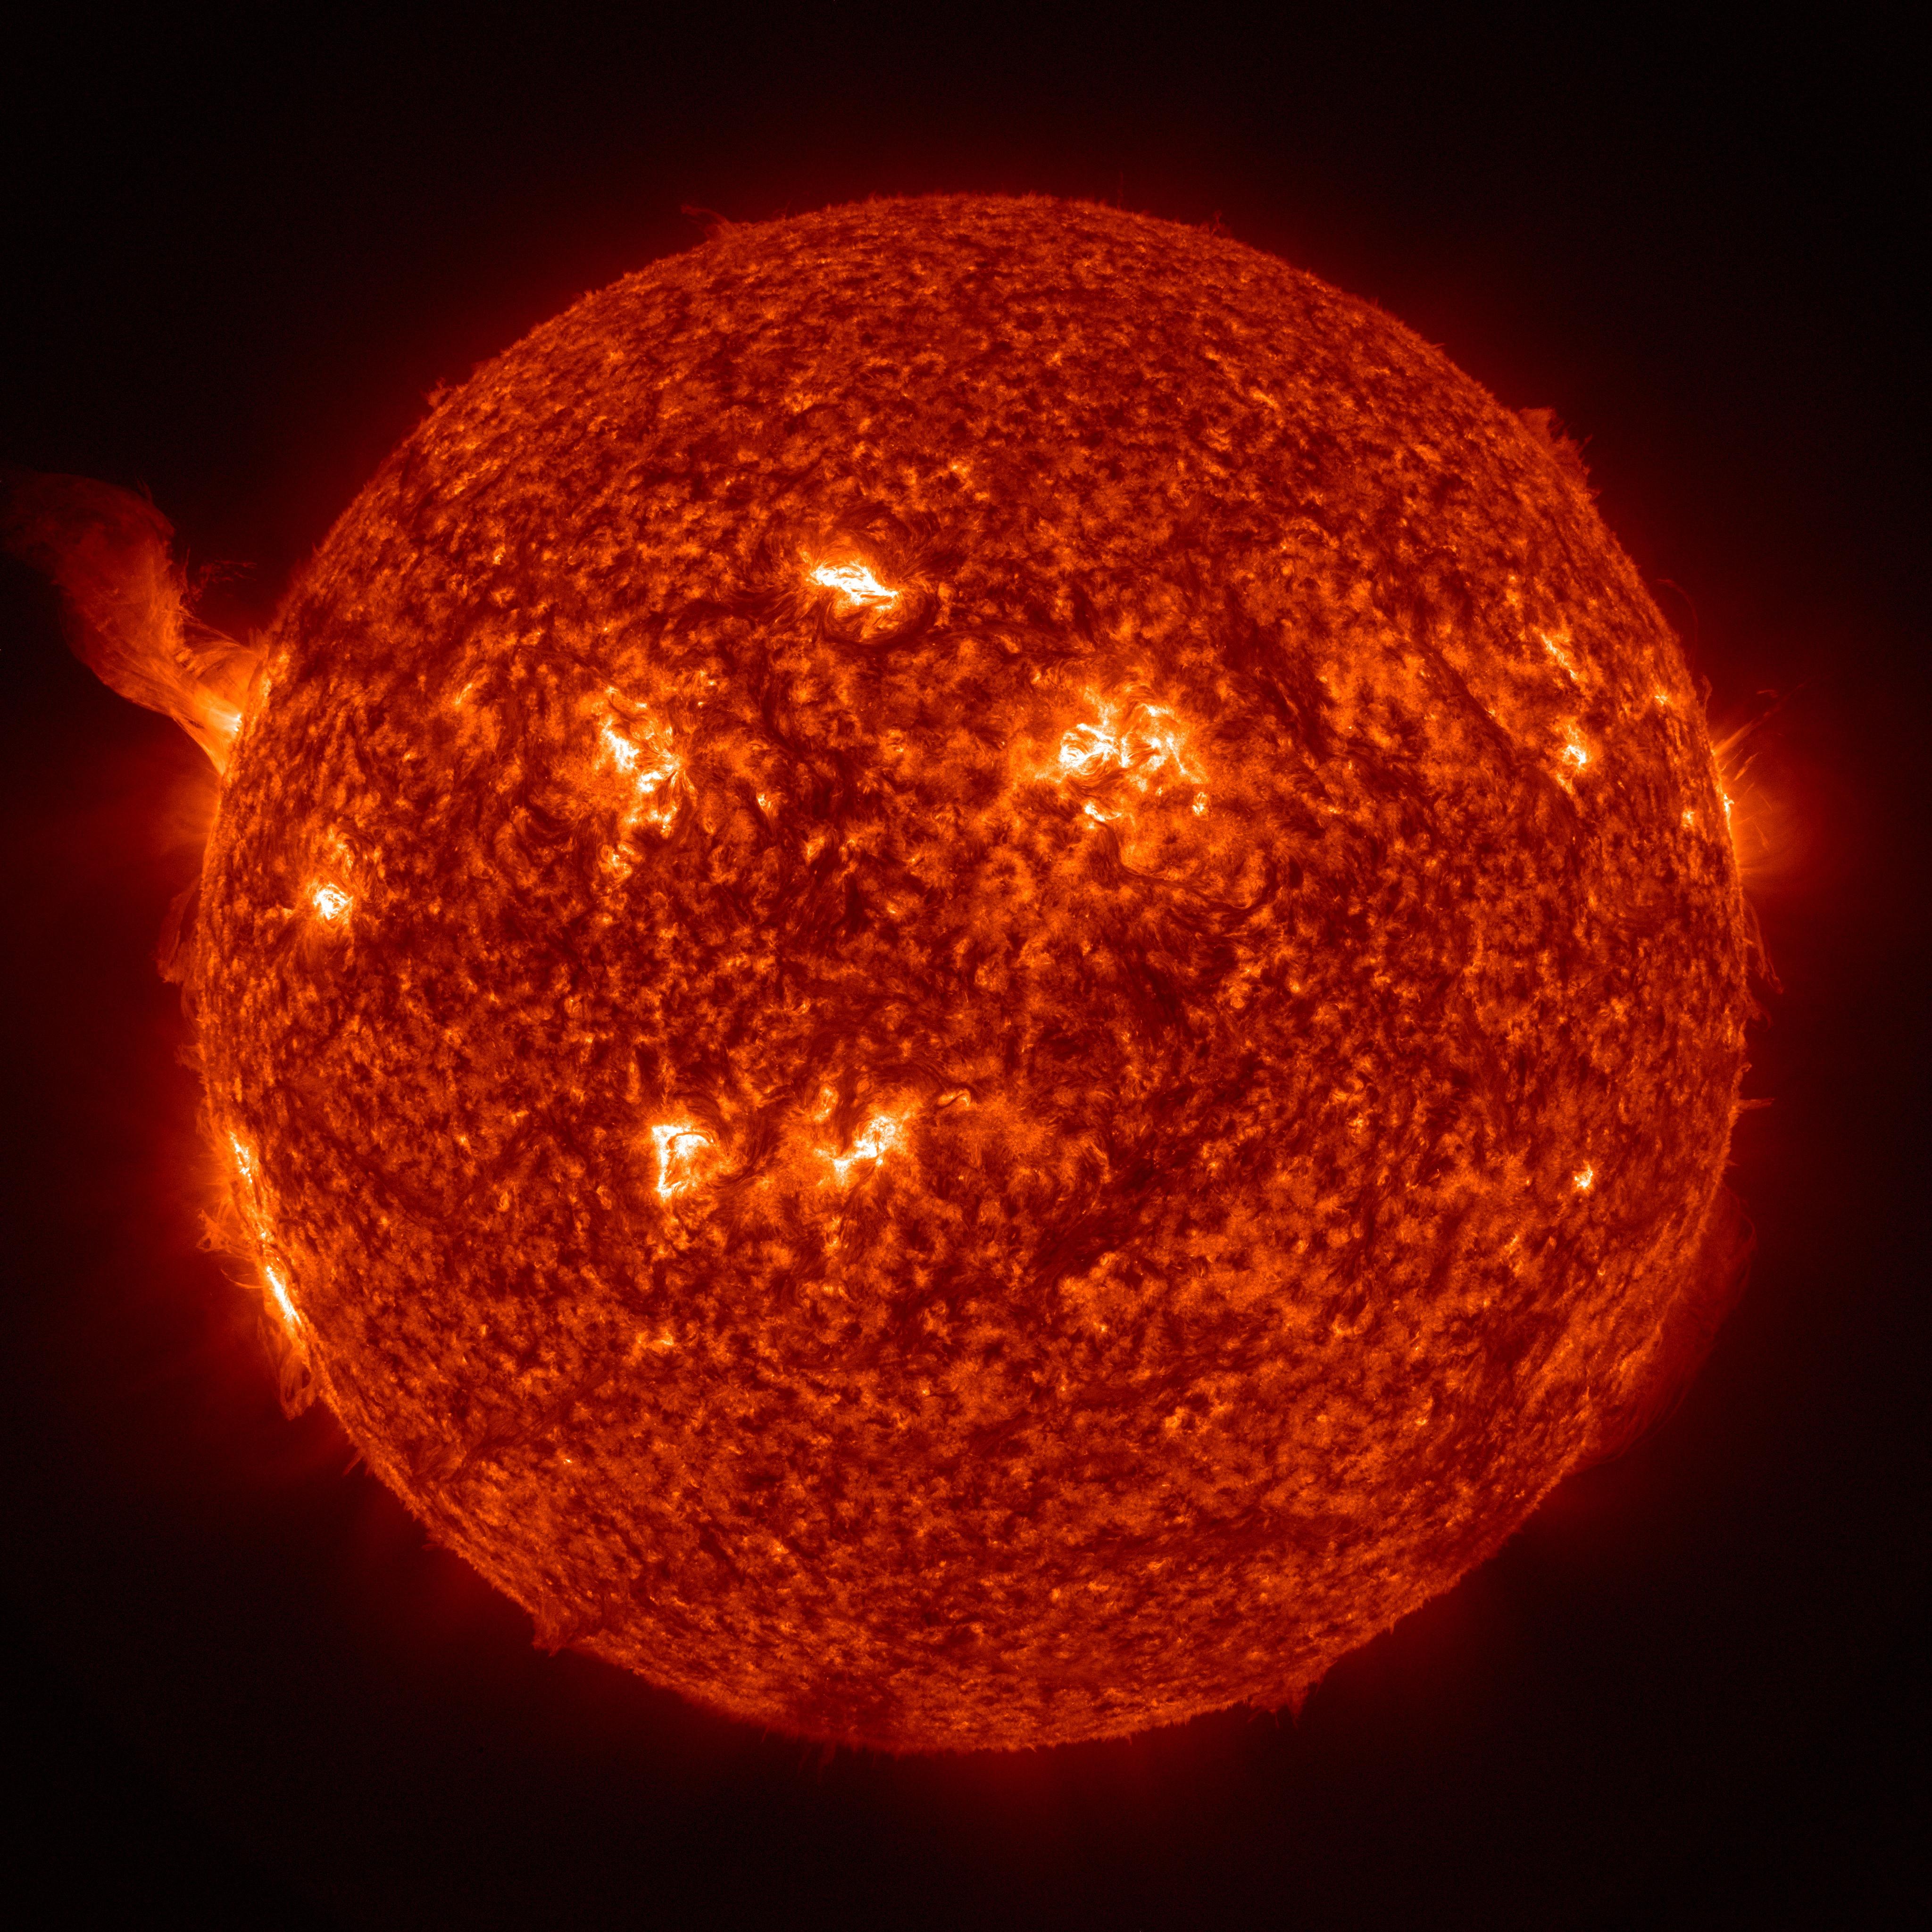 реалистичная гифка солнца информации агентства